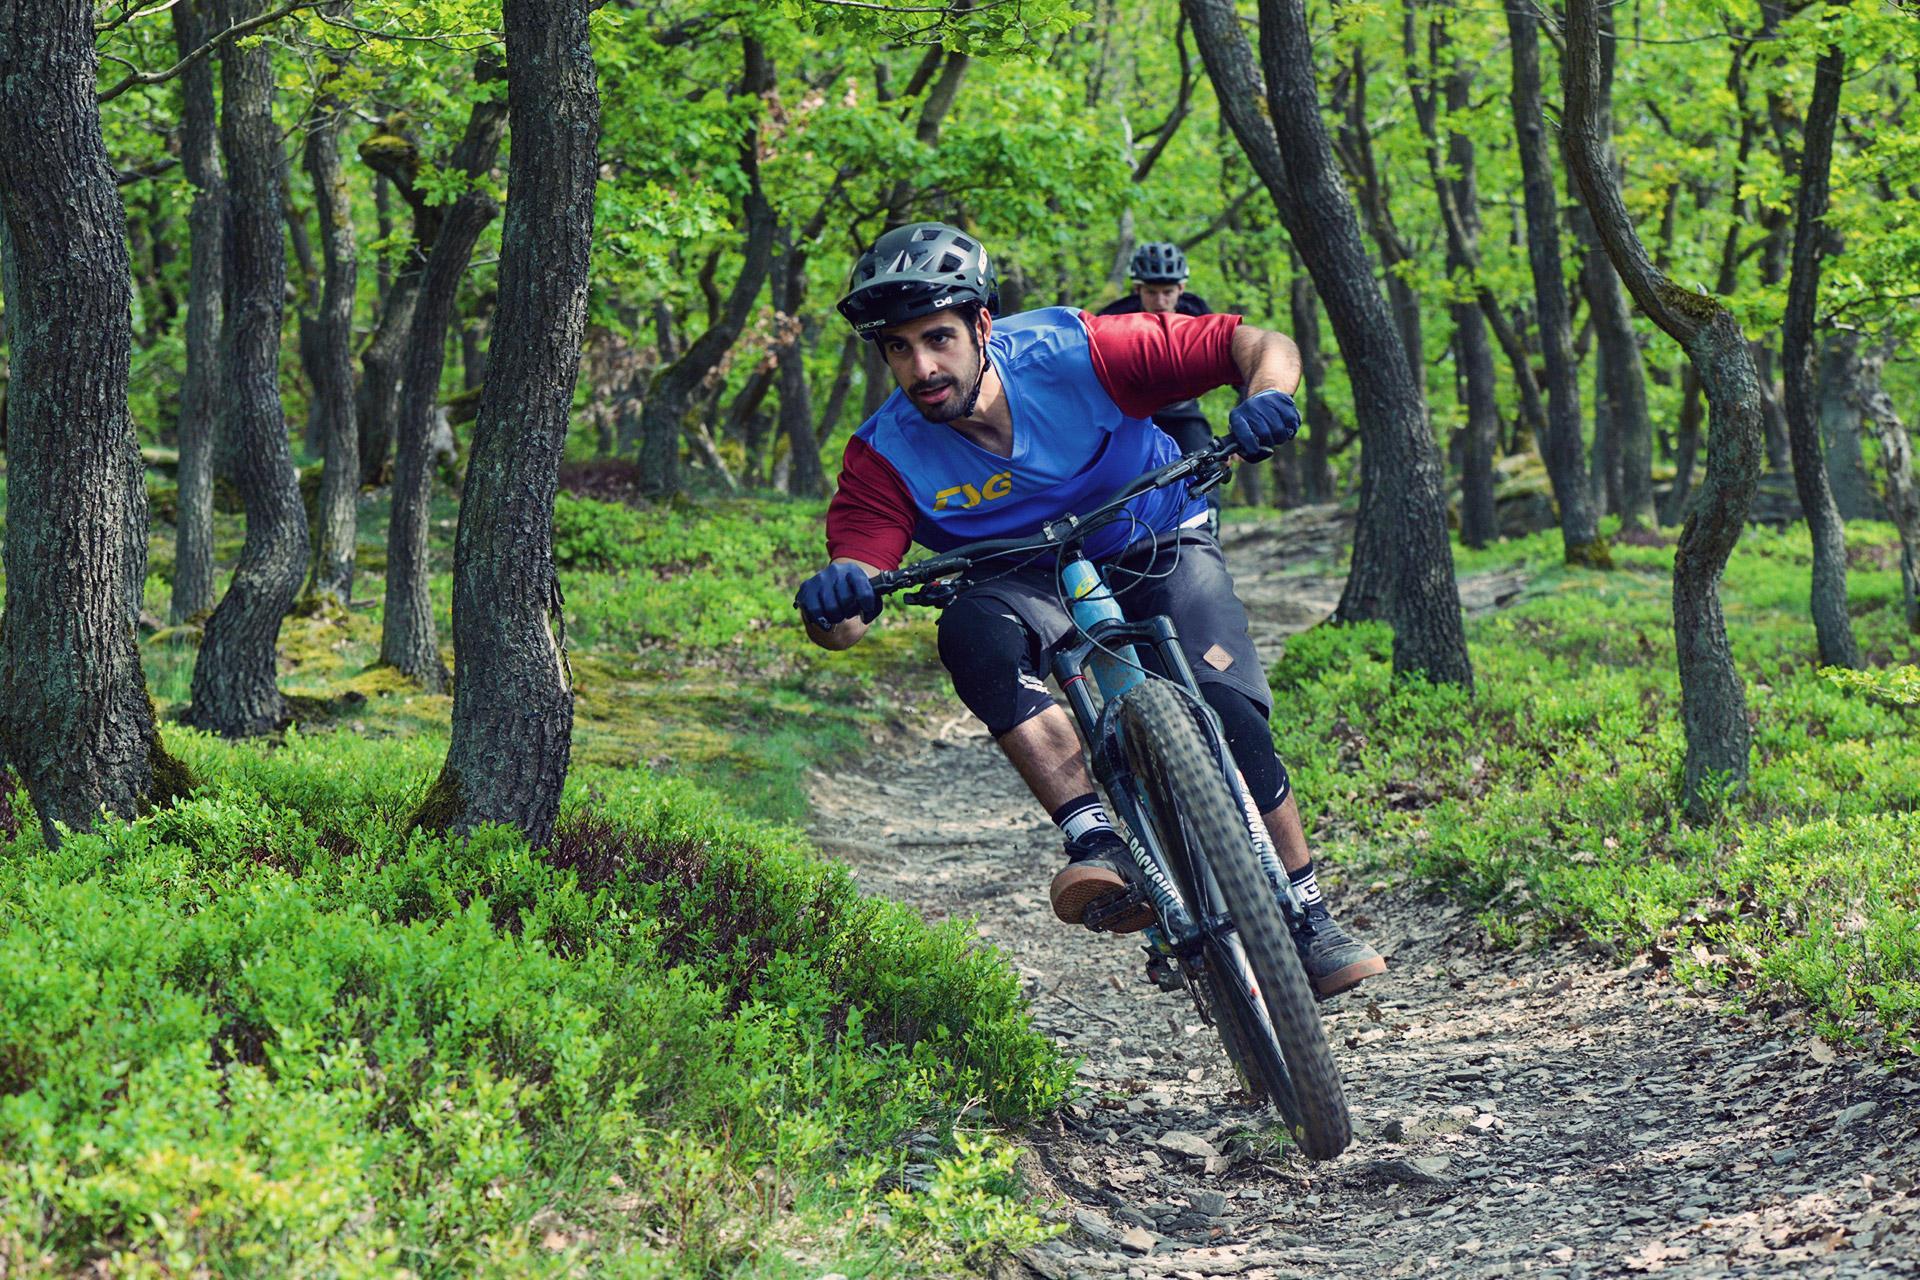 TSG Kraken Solid Color Black BMX//Skate Helmet for Bicycle